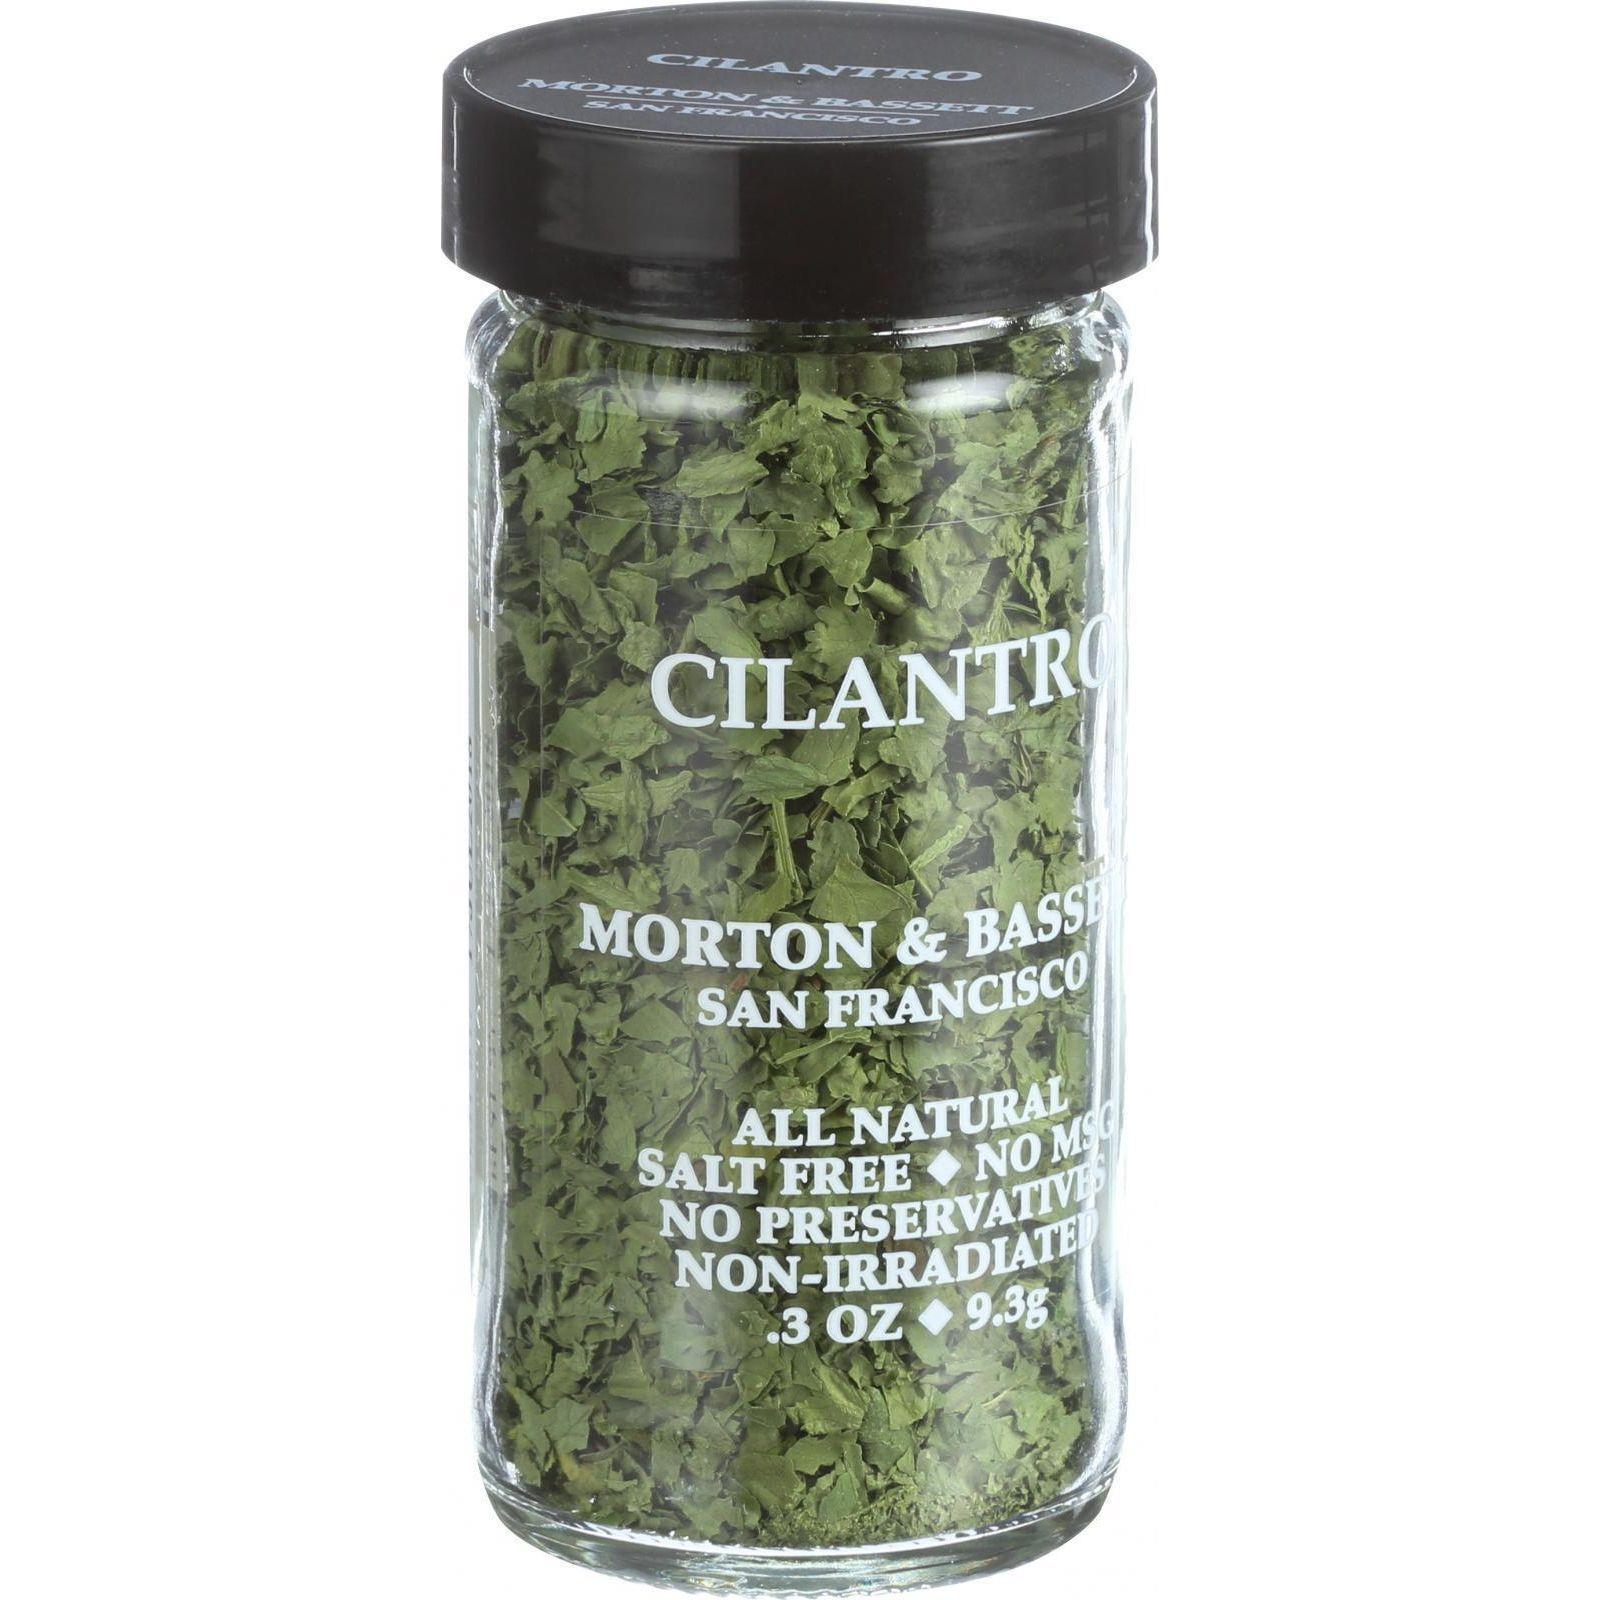 Morton and Bassett Seasoning Cilantro .3 oz Case of